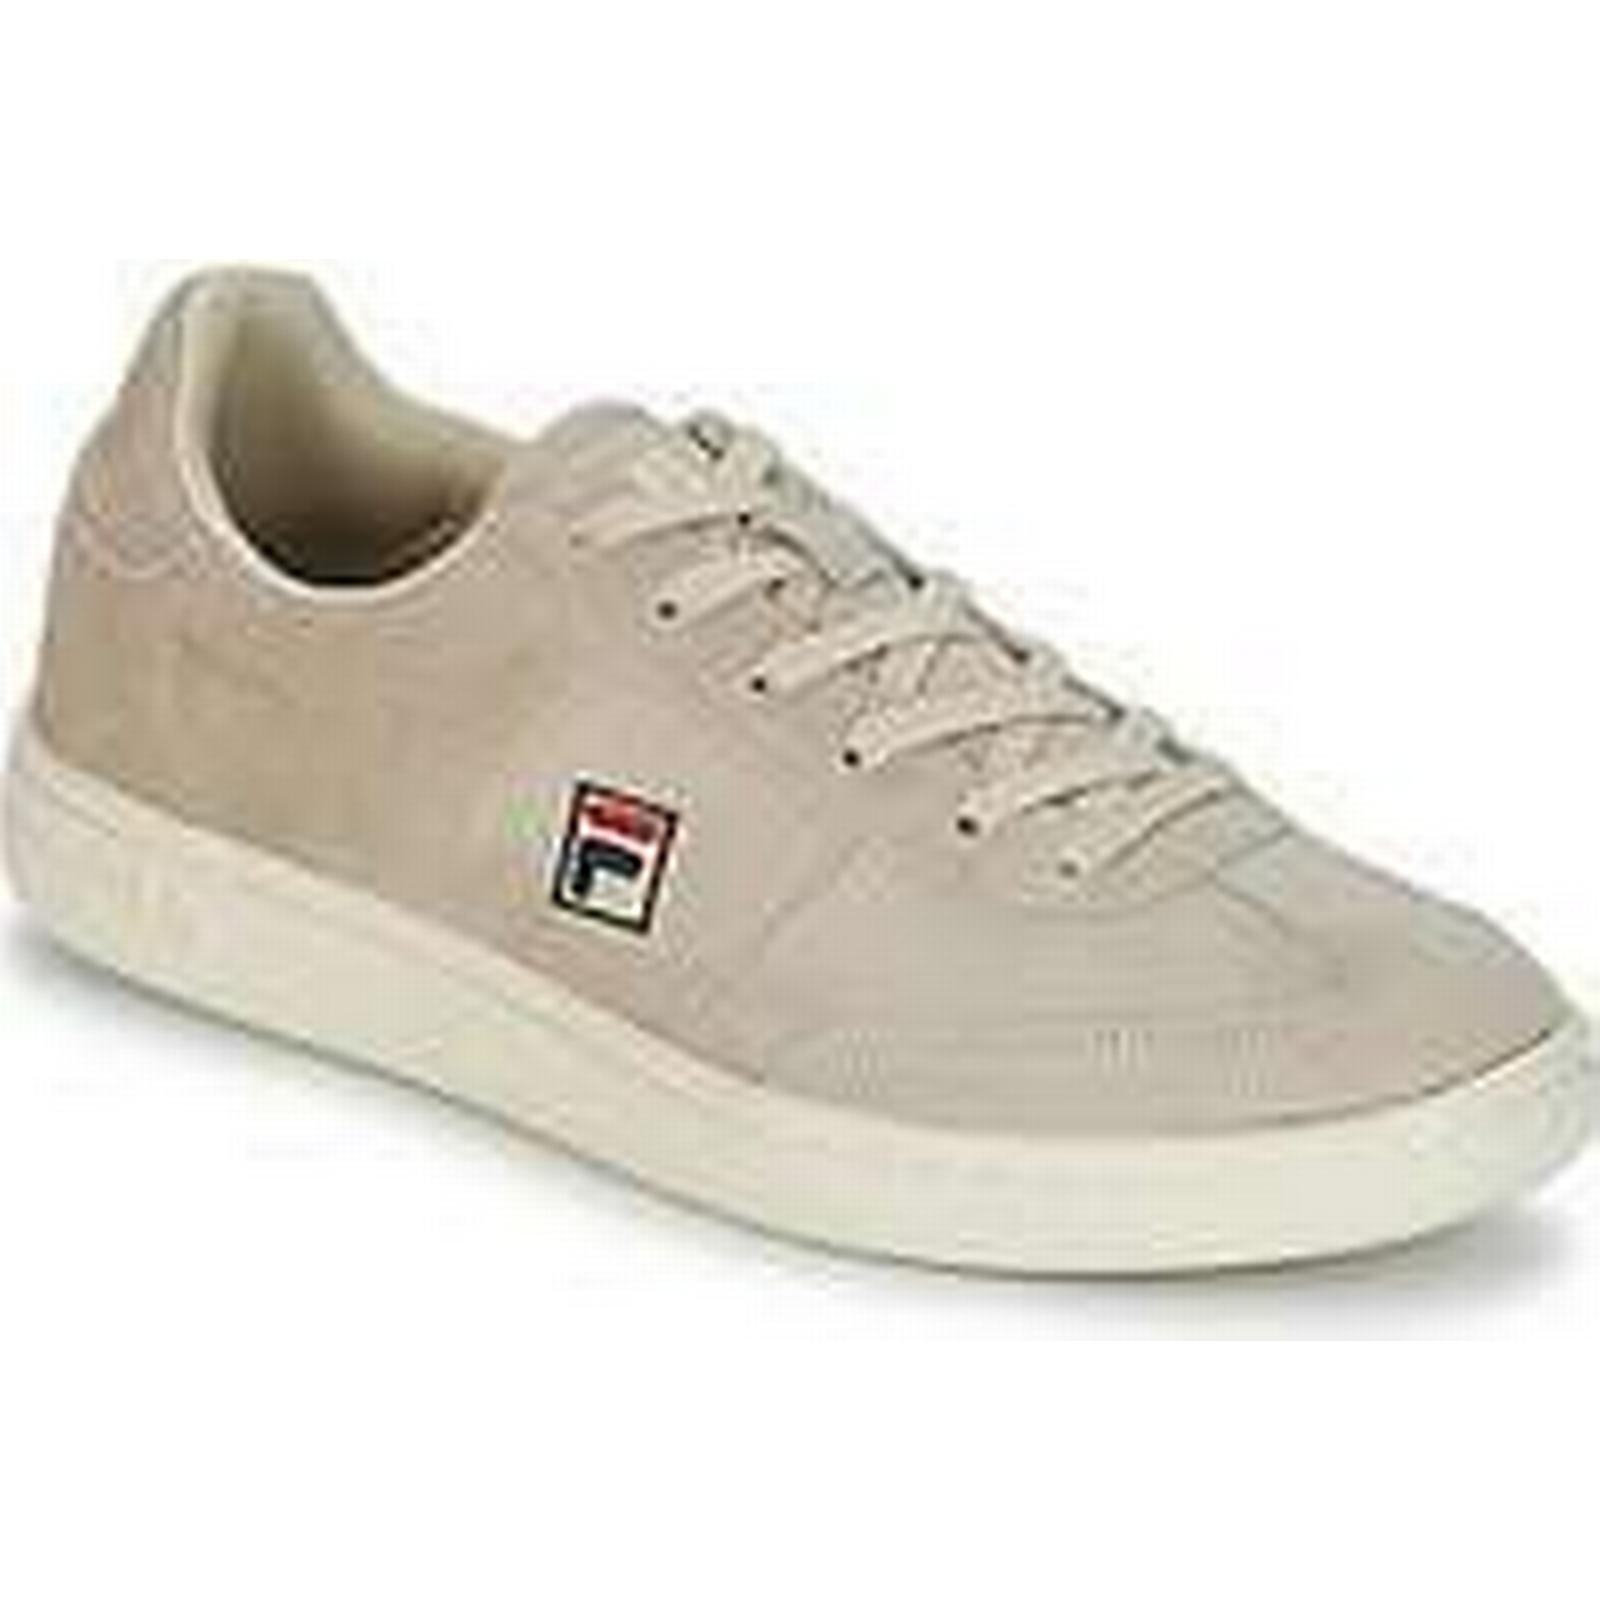 Spartoo.co.uk men's Fila PORTLAND men's Spartoo.co.uk Shoes (Trainers) in Beige 88d542